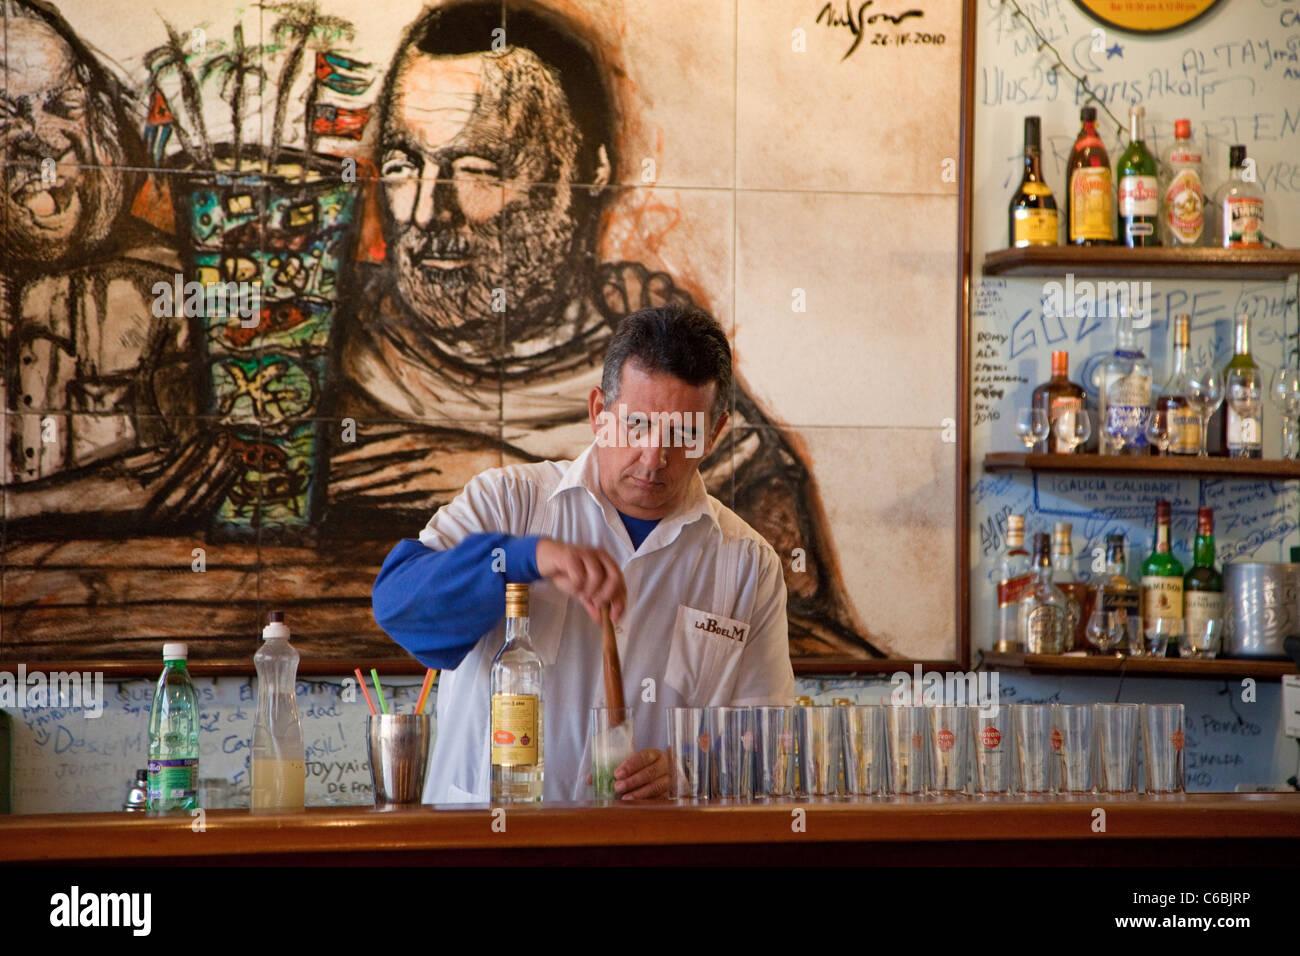 Kuba, Havanna. La Bodeguita del Medio. Barkeeper bei der Arbeit. Stockbild